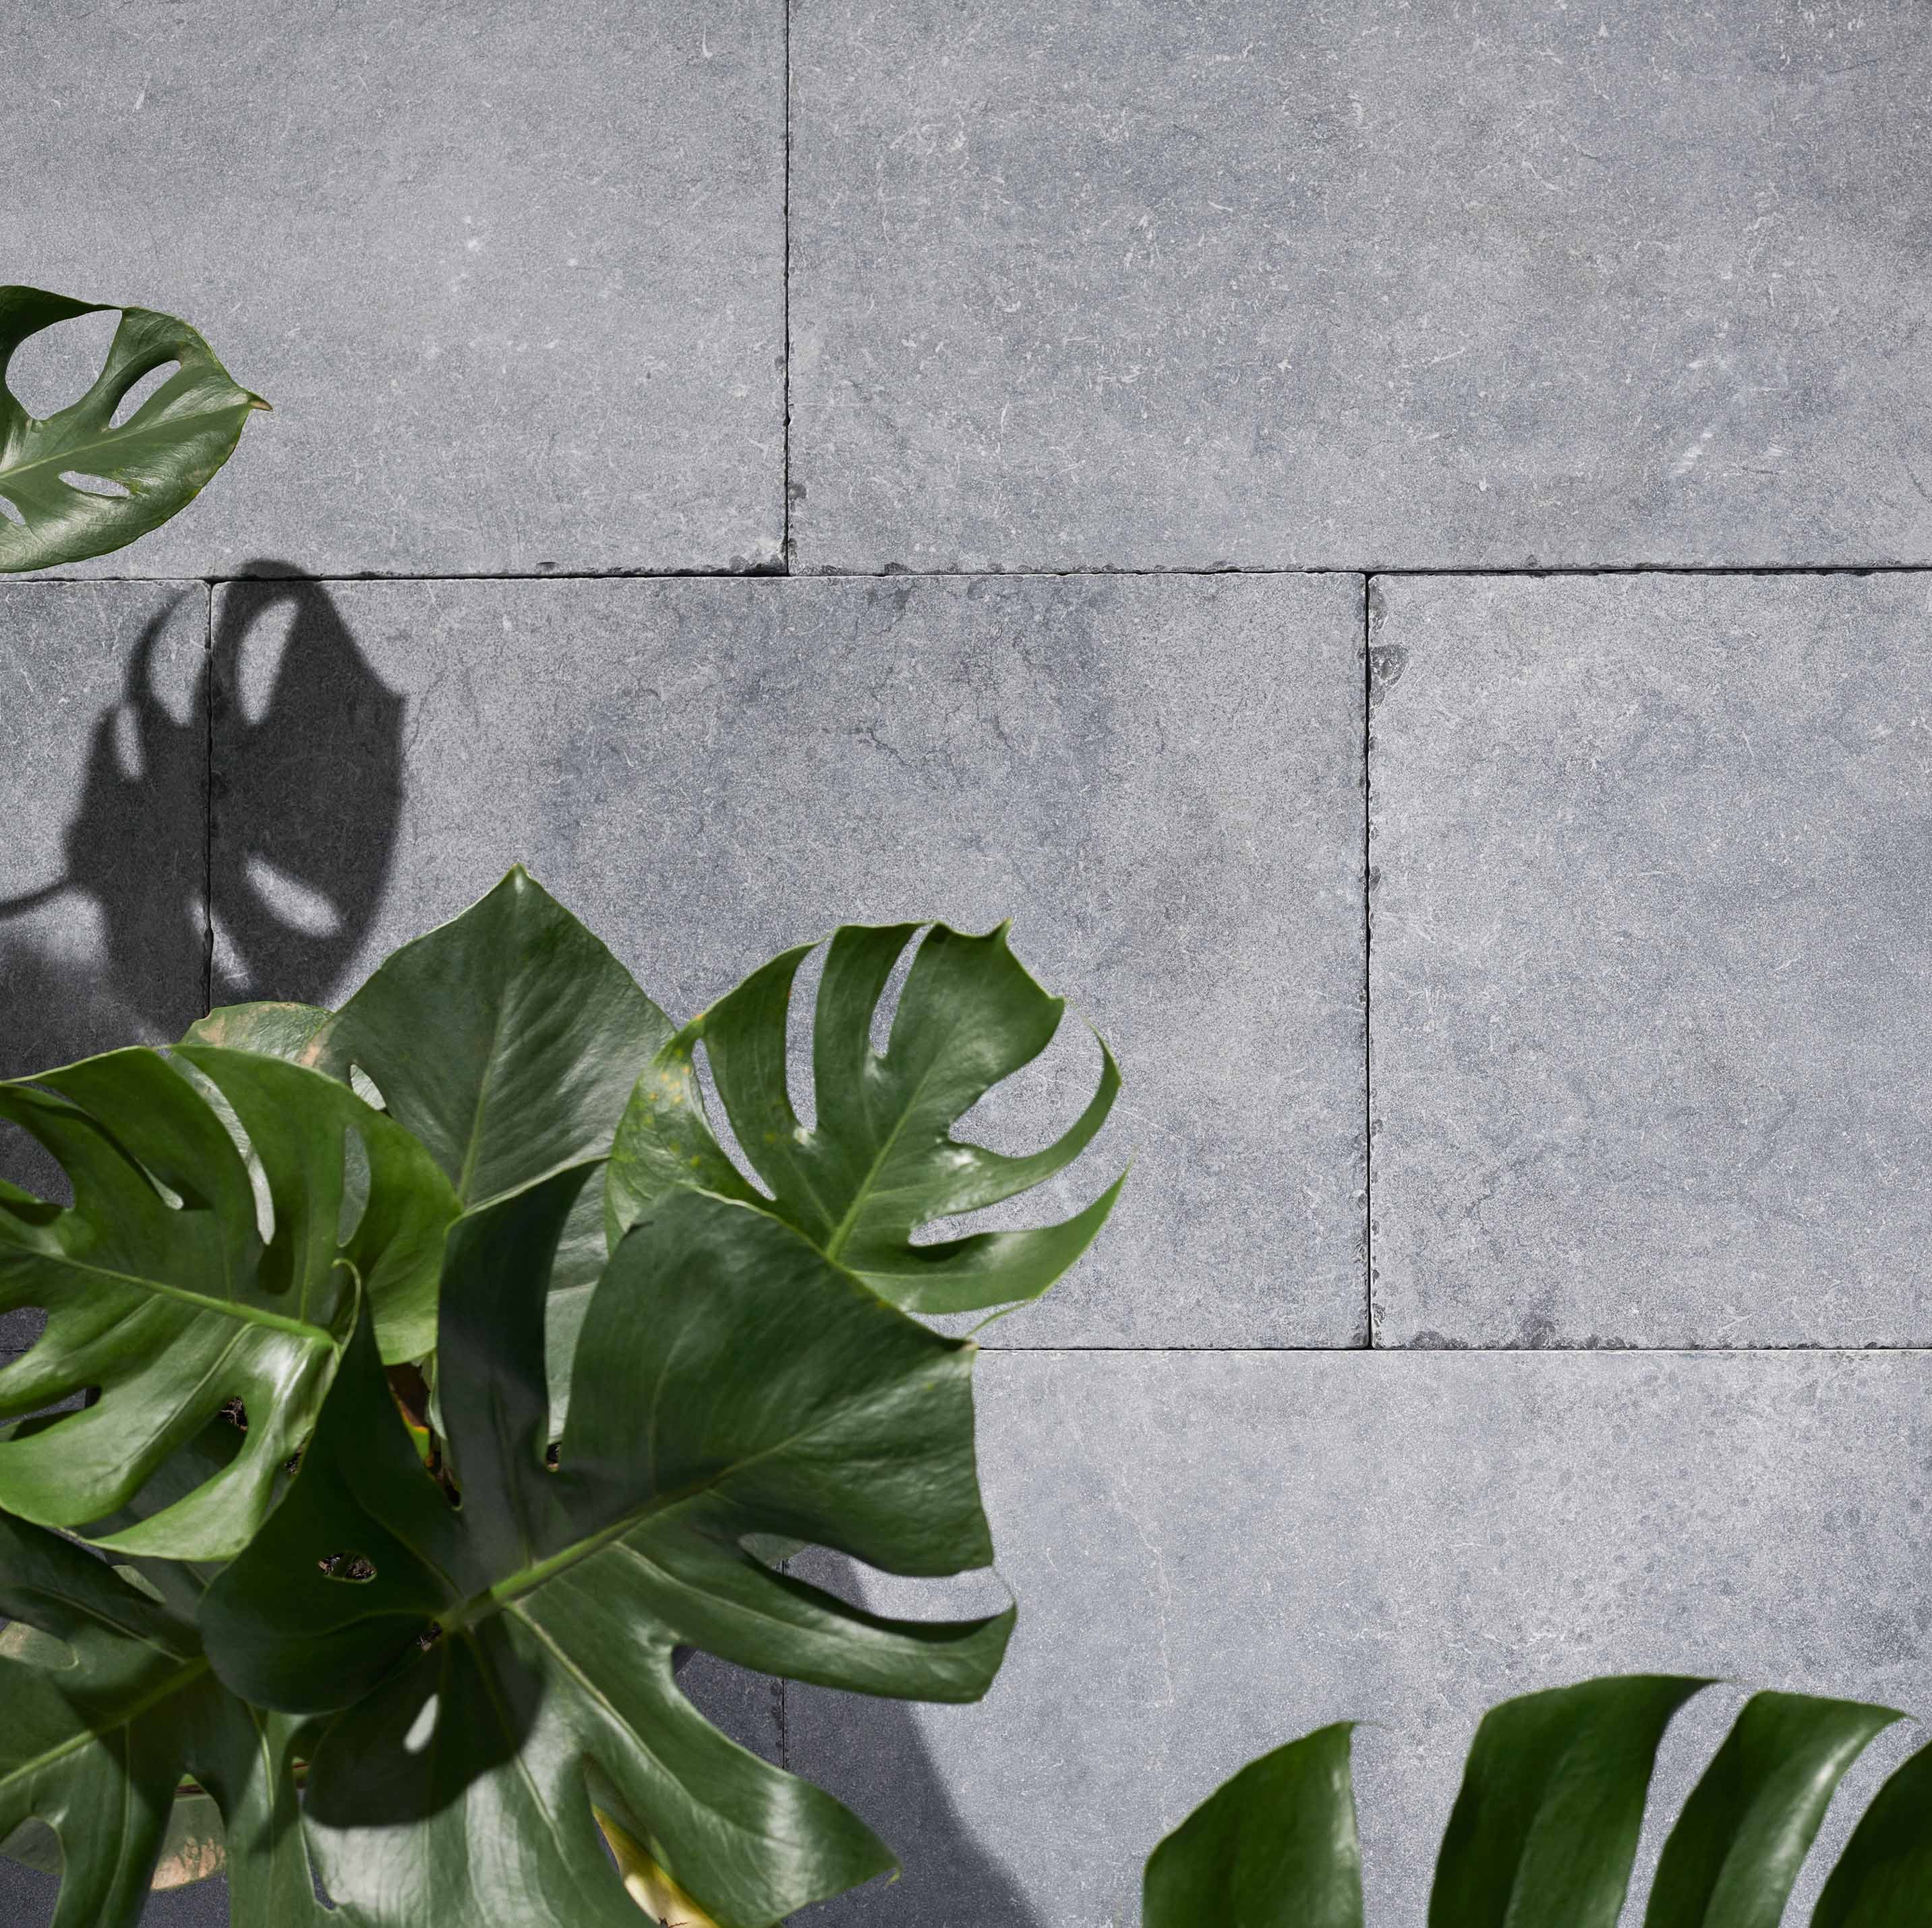 Stone-Pavers-and-Tiles-Outdoor Hero pantera